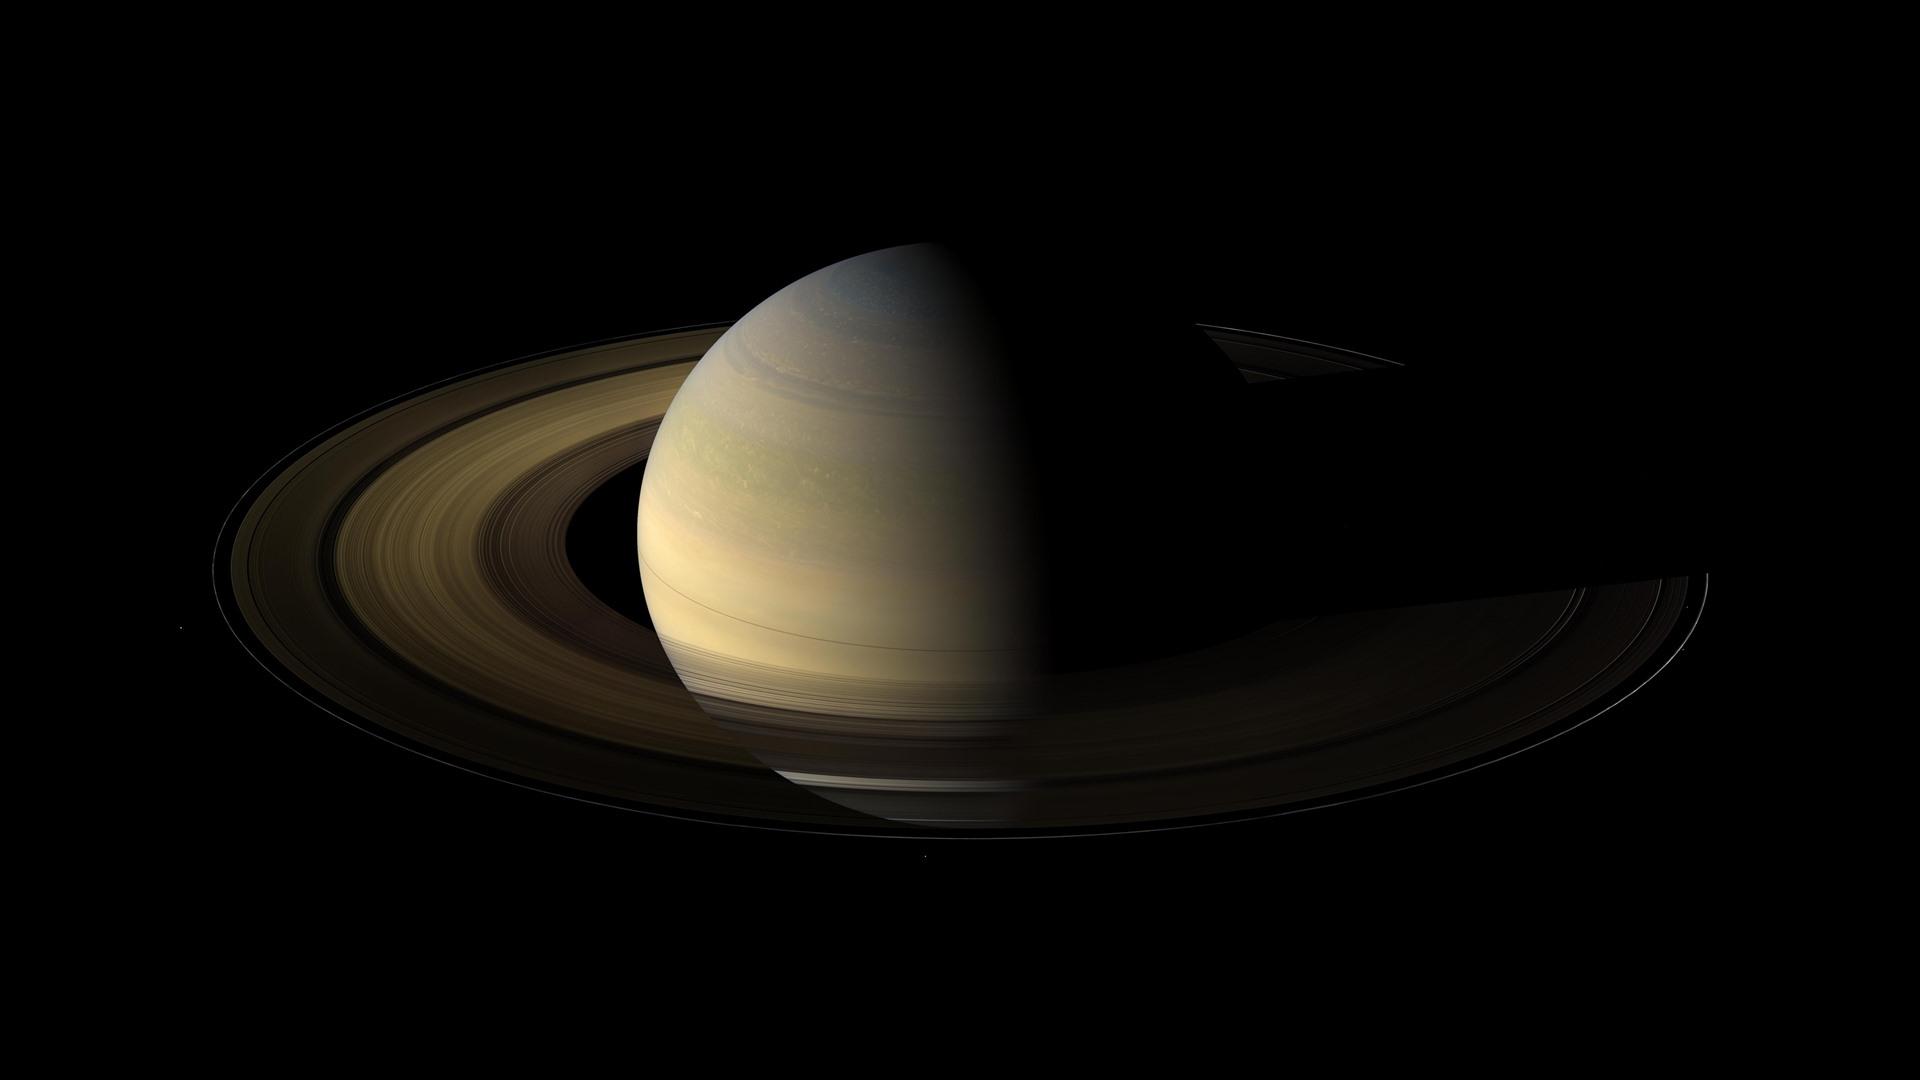 Wallpaper Space Saturn Round Ring Darkness 3840x2160 Uhd